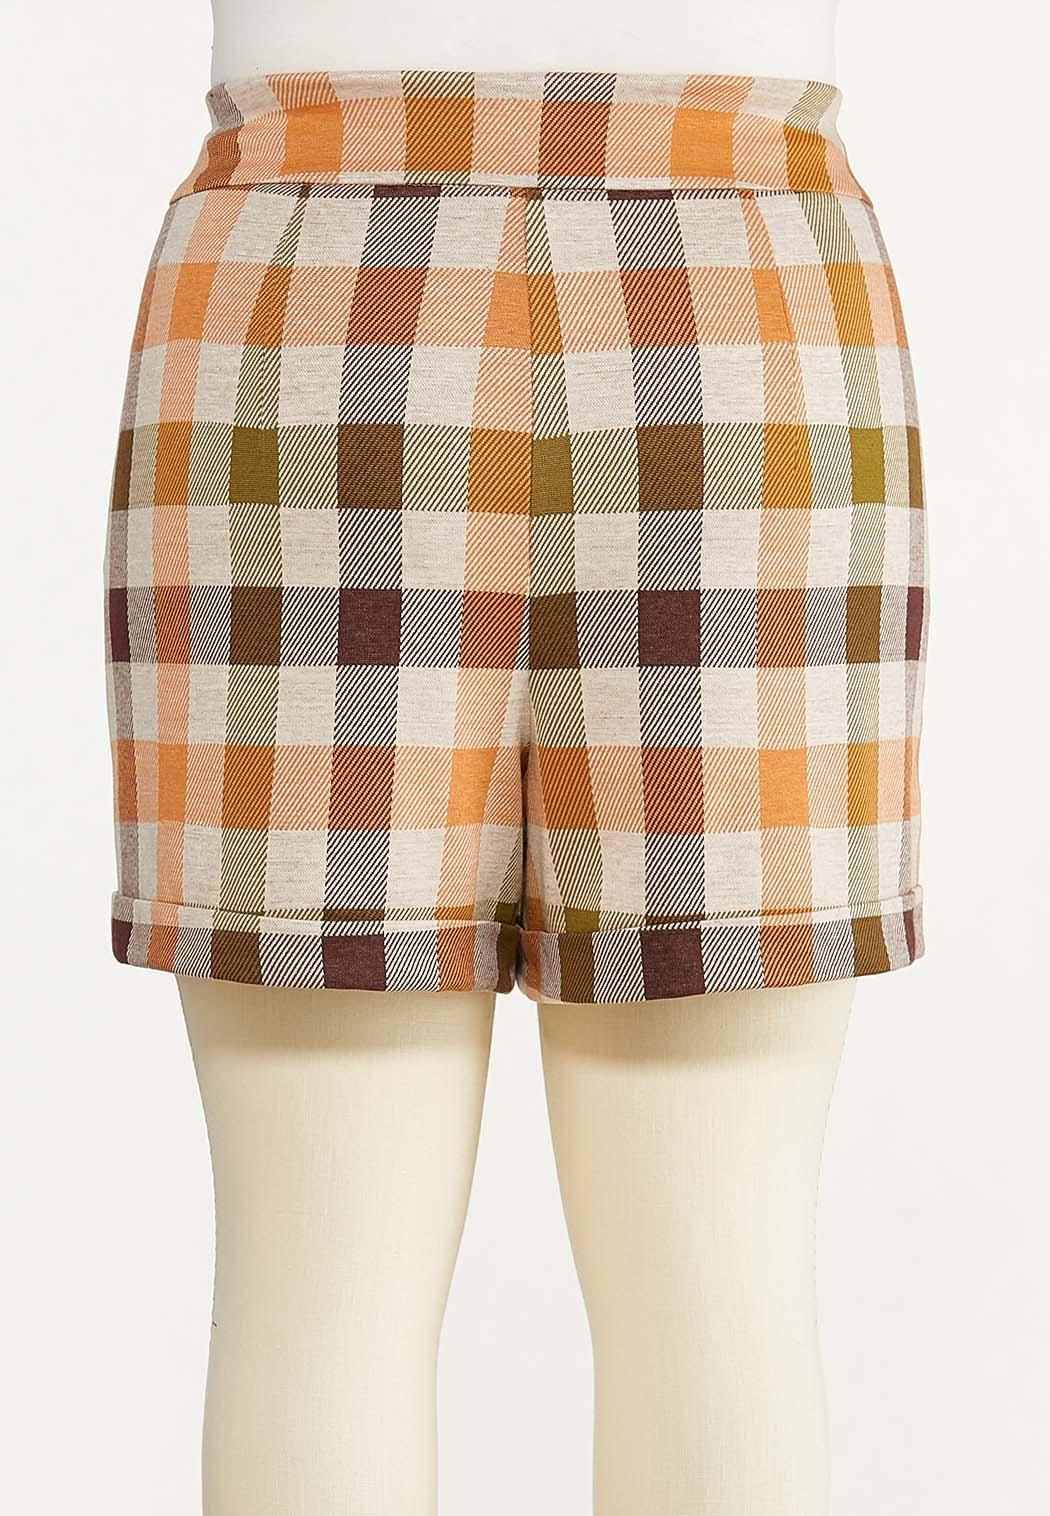 Plus Size Harvest Plaid Shorts (Item #44651980)